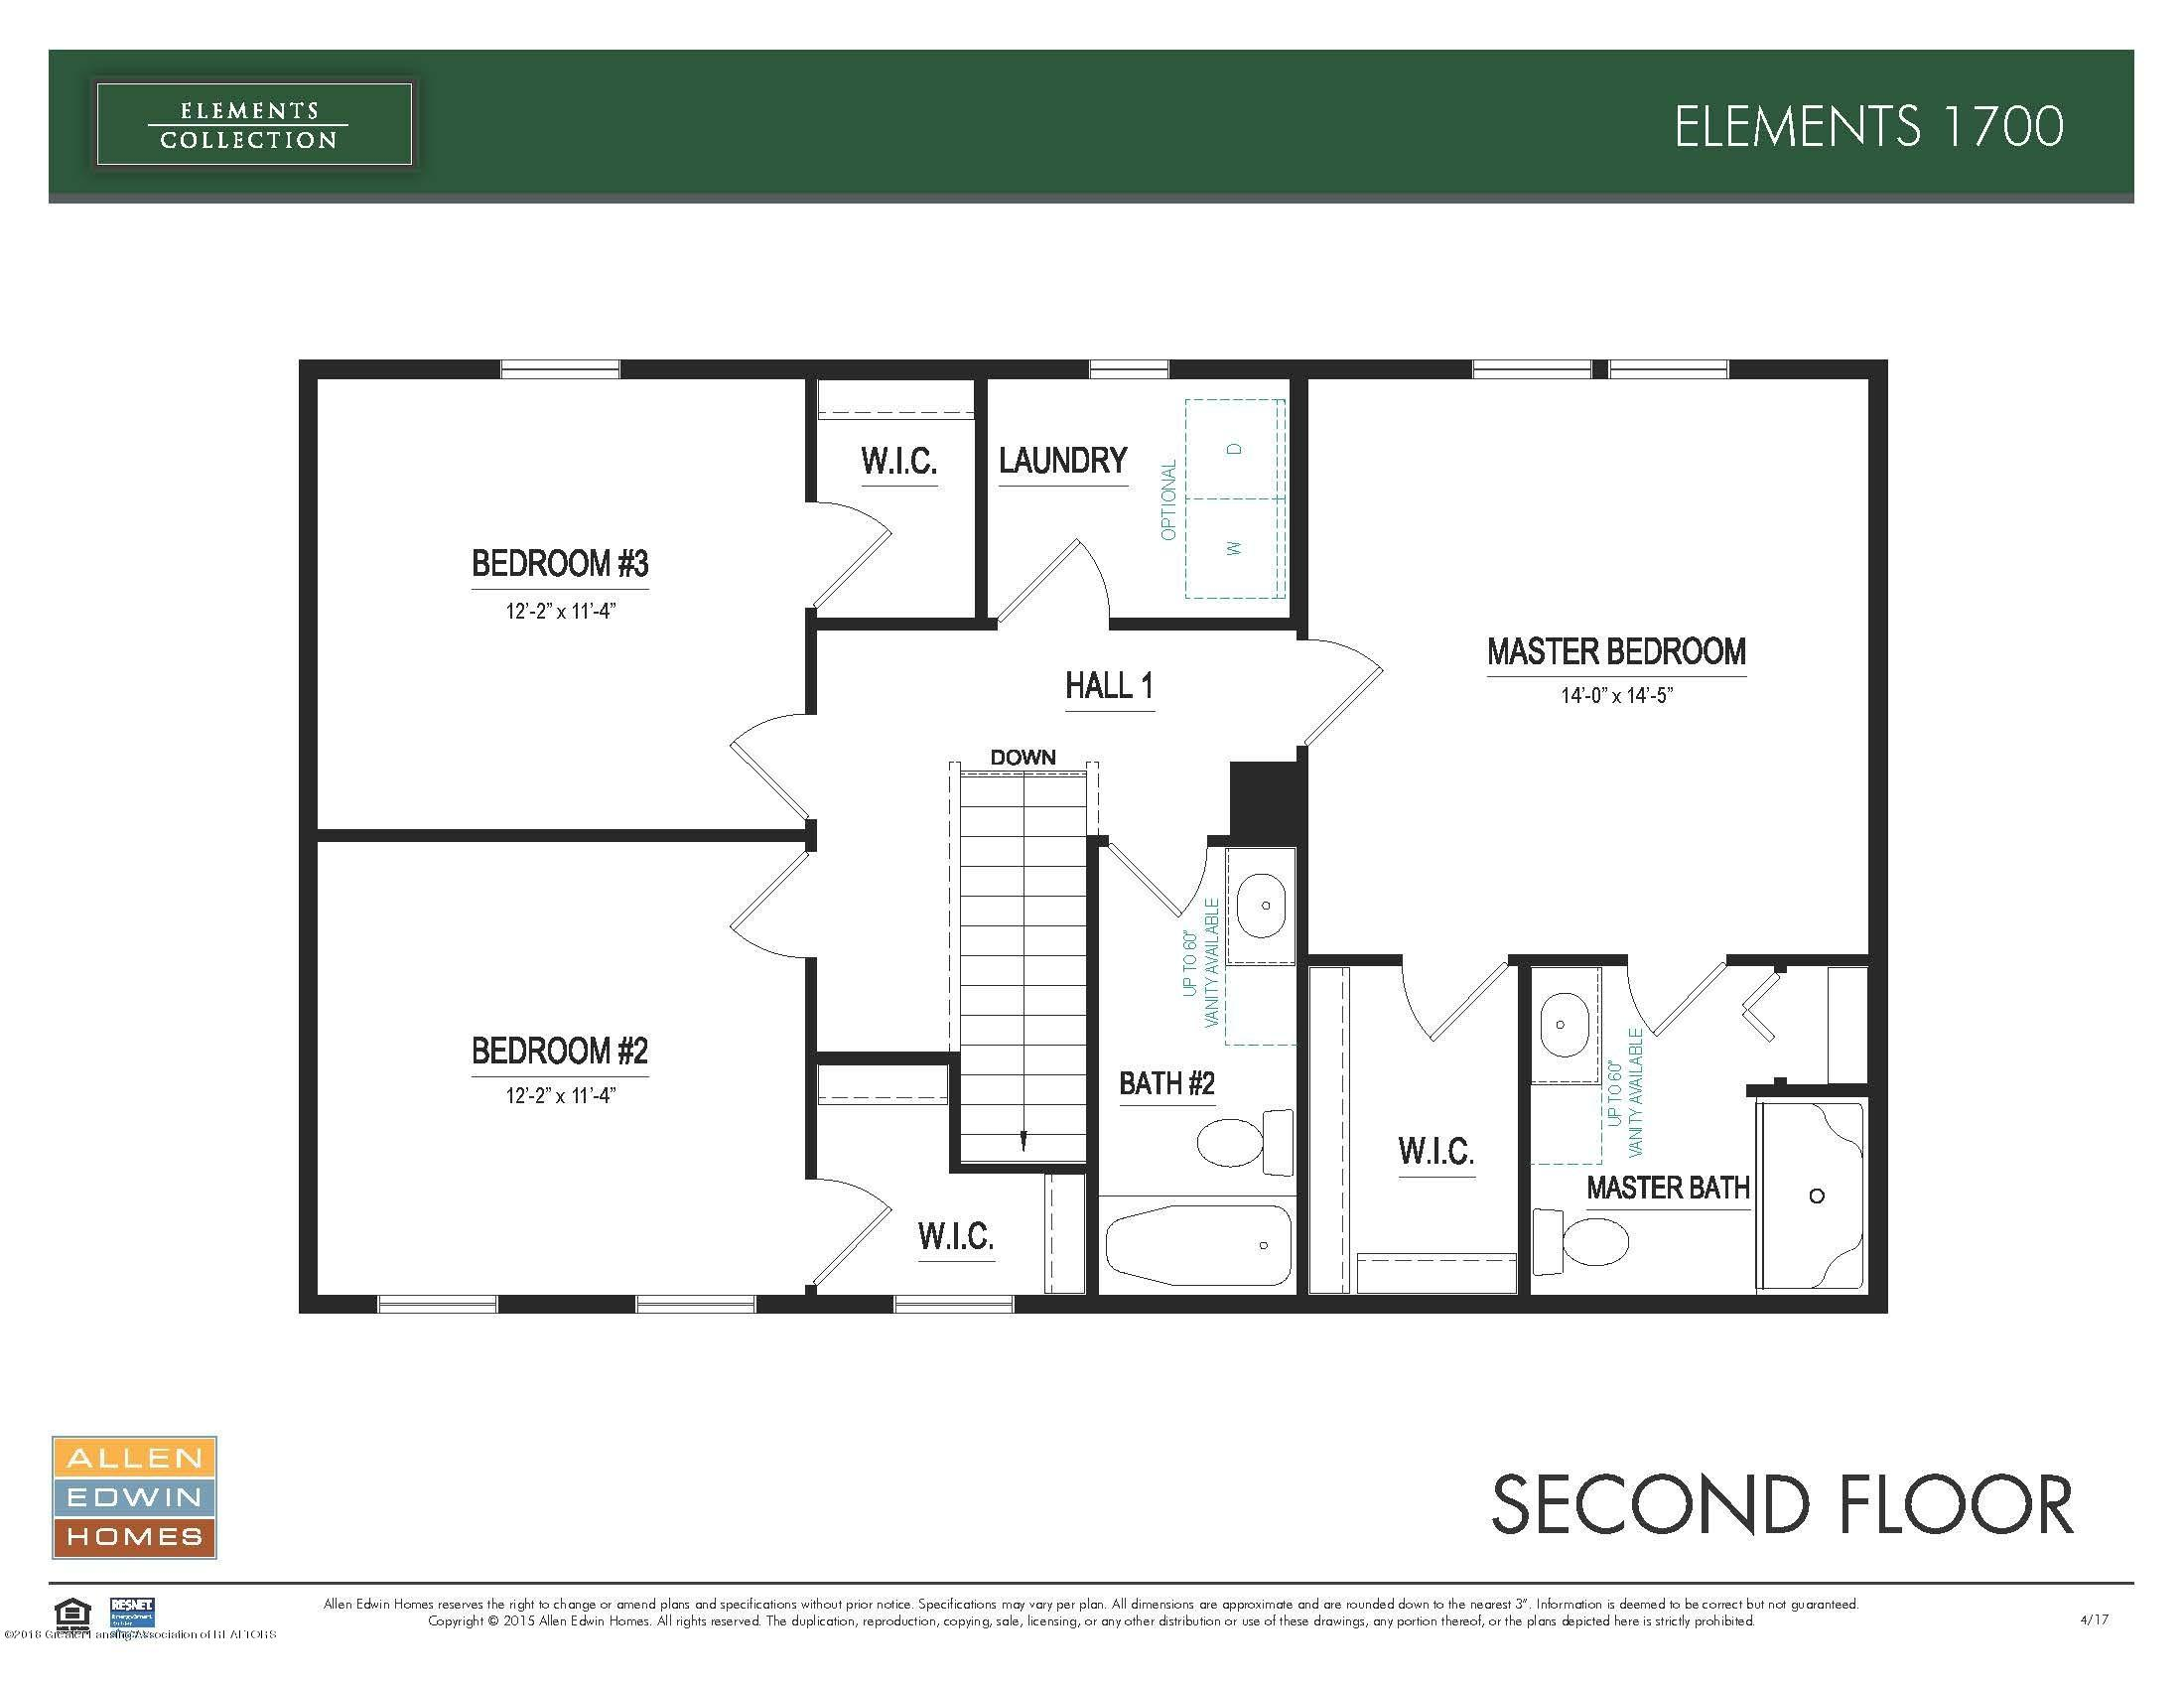 3536 Fernwood Ln - Elements 1700 Second Floor - 15